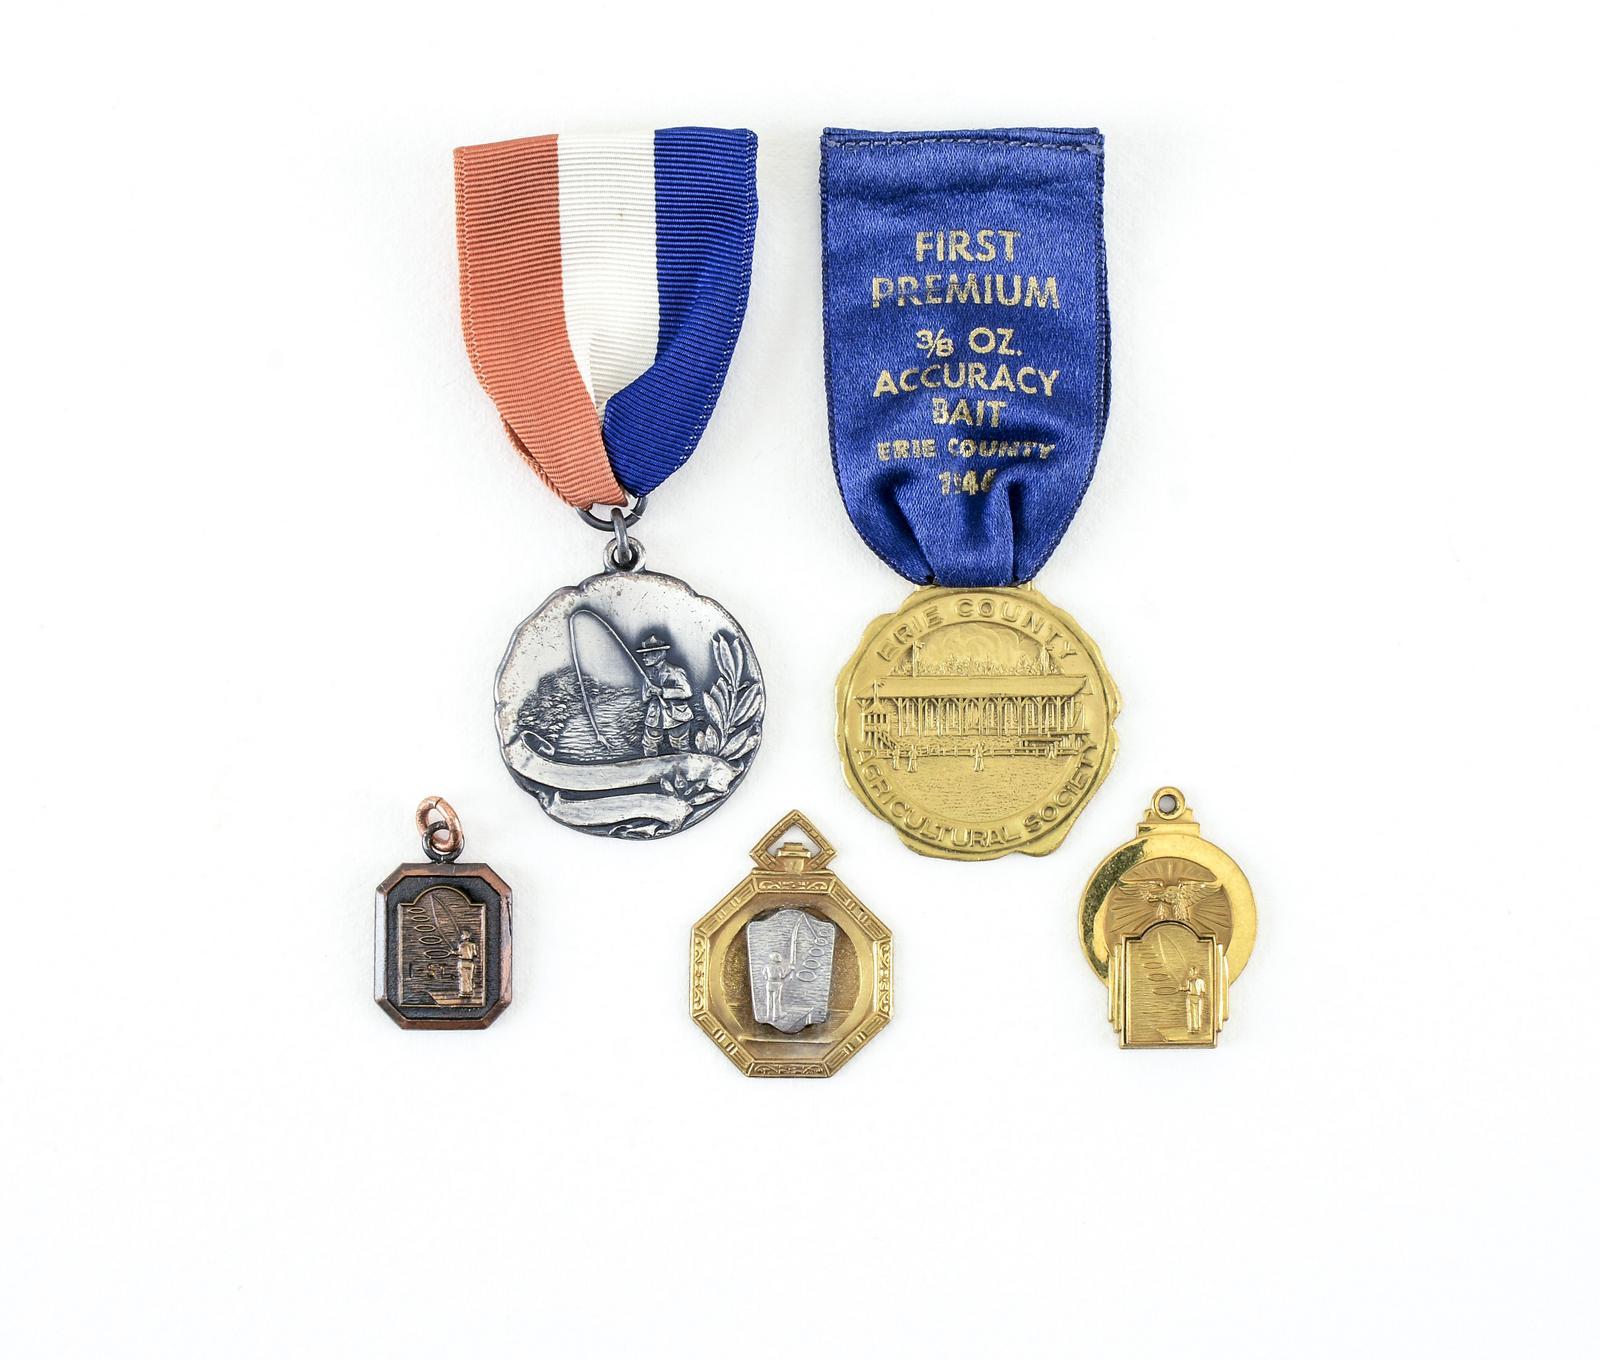 5 Vintage Tournament Casting Award Medals | Lang's Auction Inc